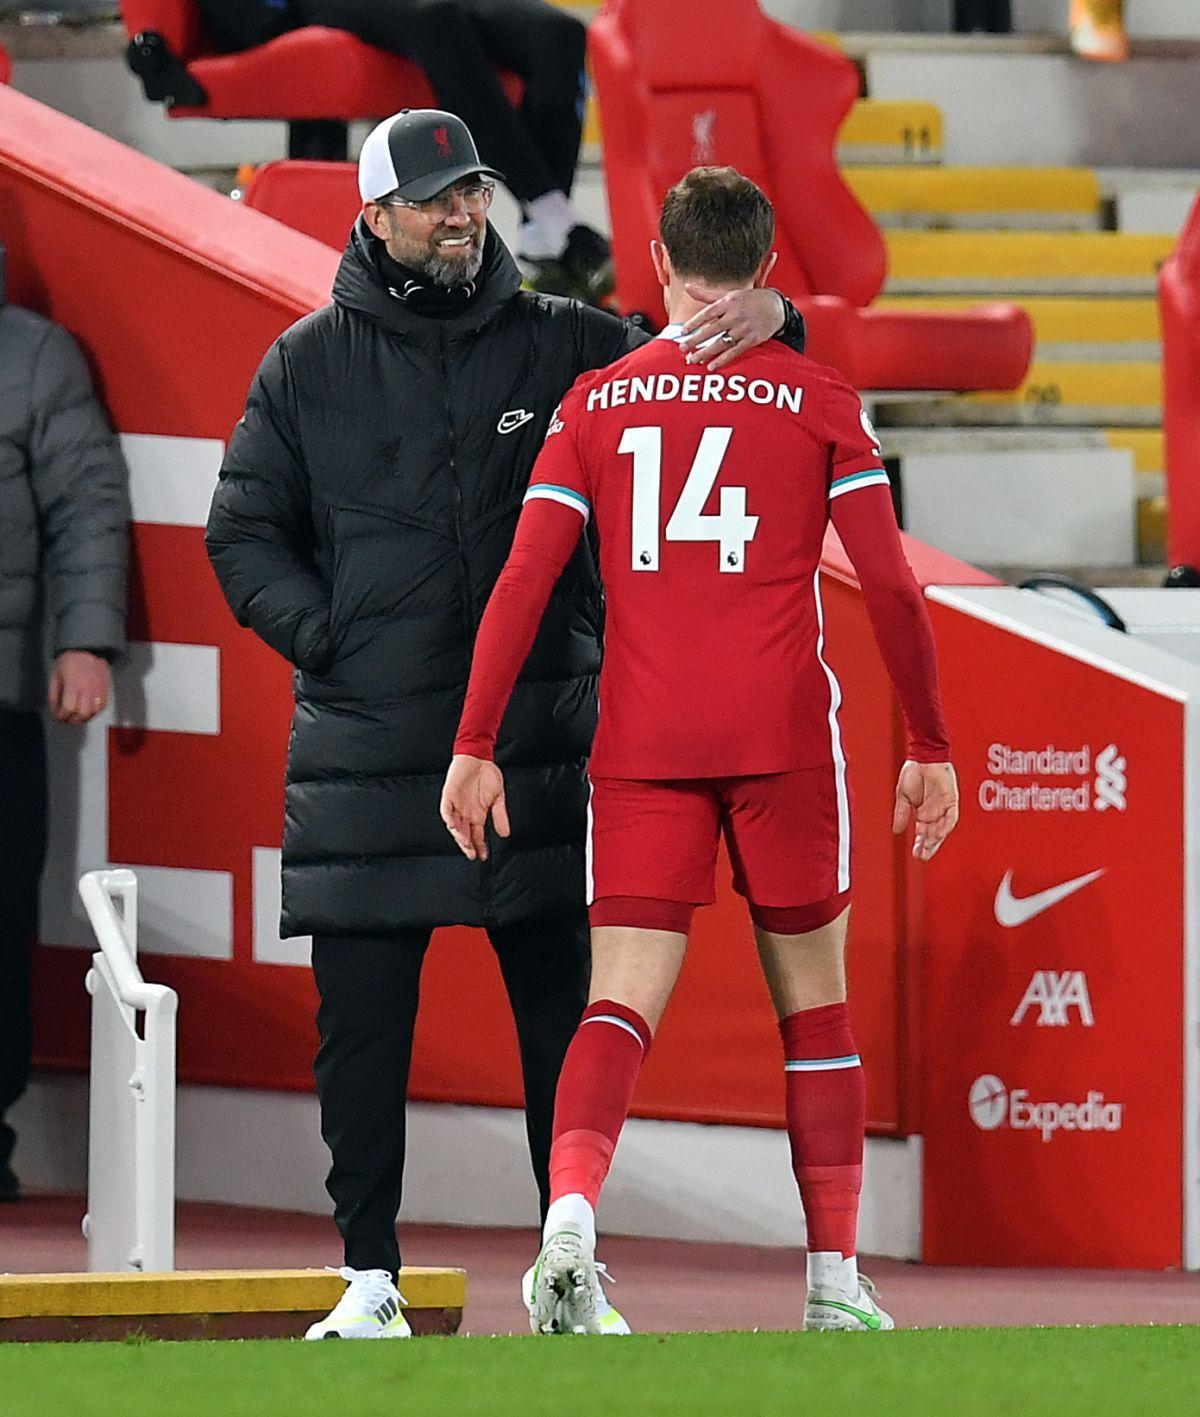 Jurgen Klopp hopes Jordan Henderson will be able to play again this season